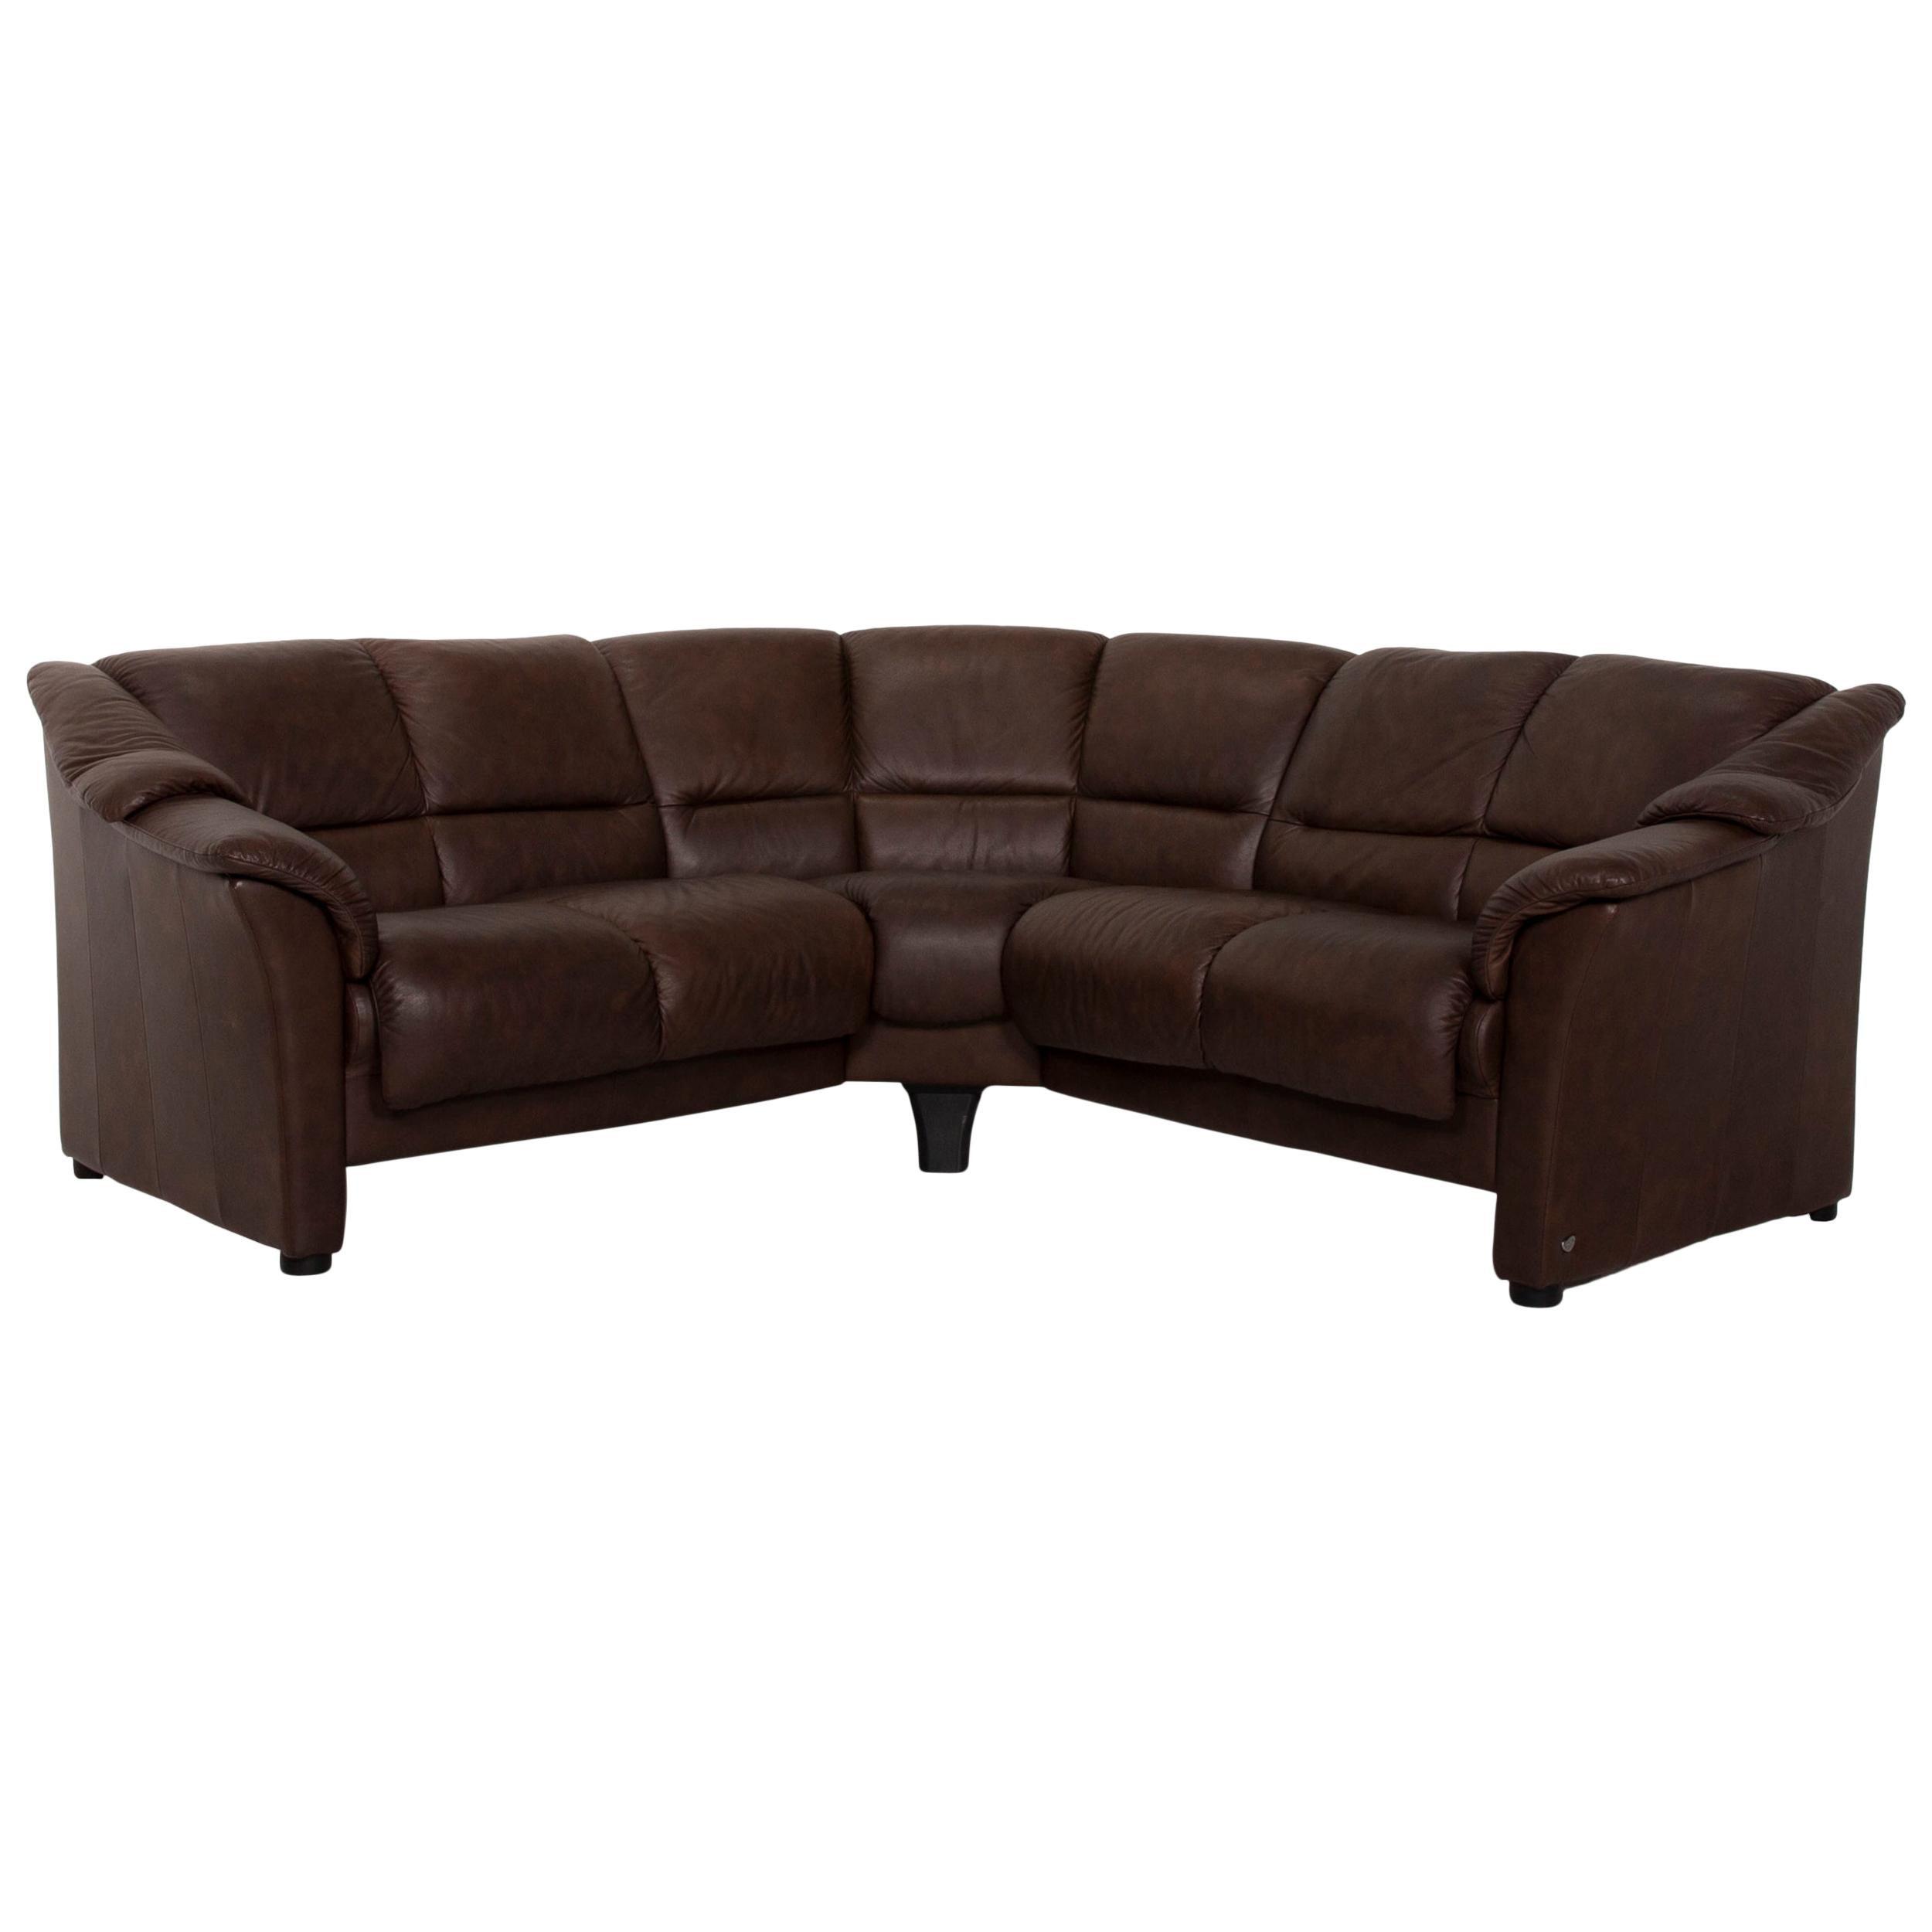 Stressless Oslo Leather Corner Sofa Brown Dark Brown Sofa Couch